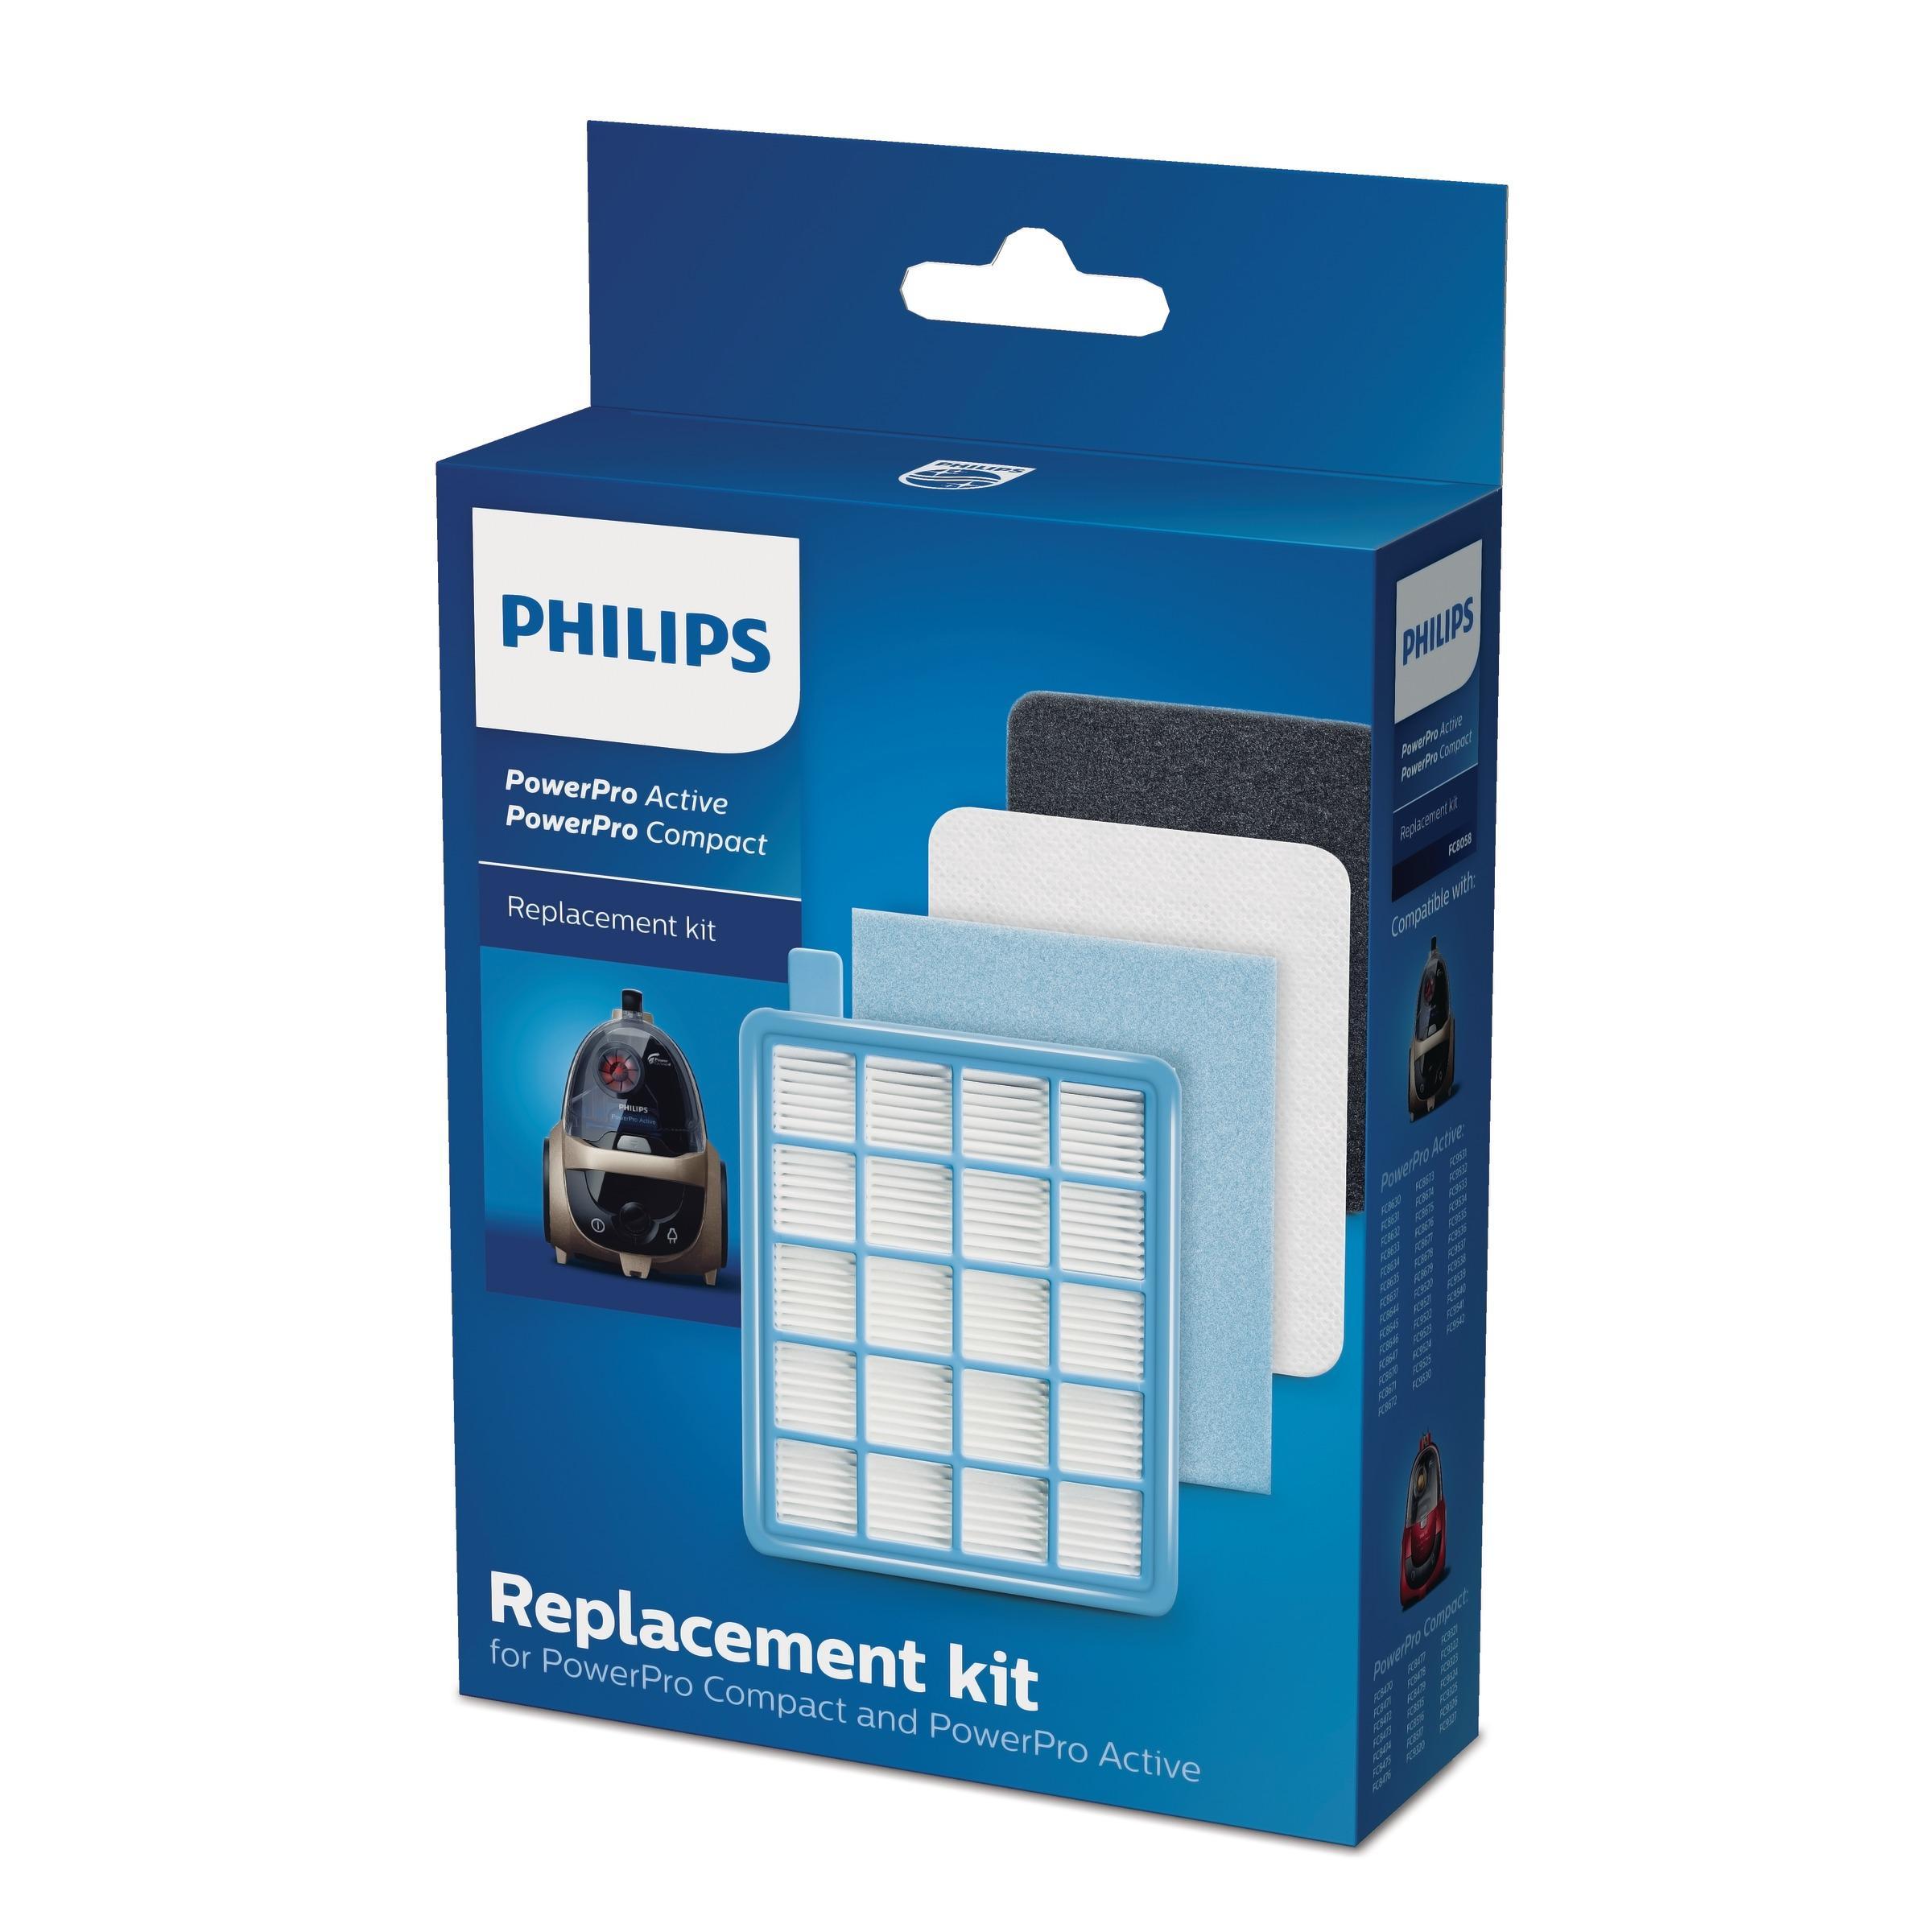 Amazon.de: Philips komplettes Filterset für beutellose